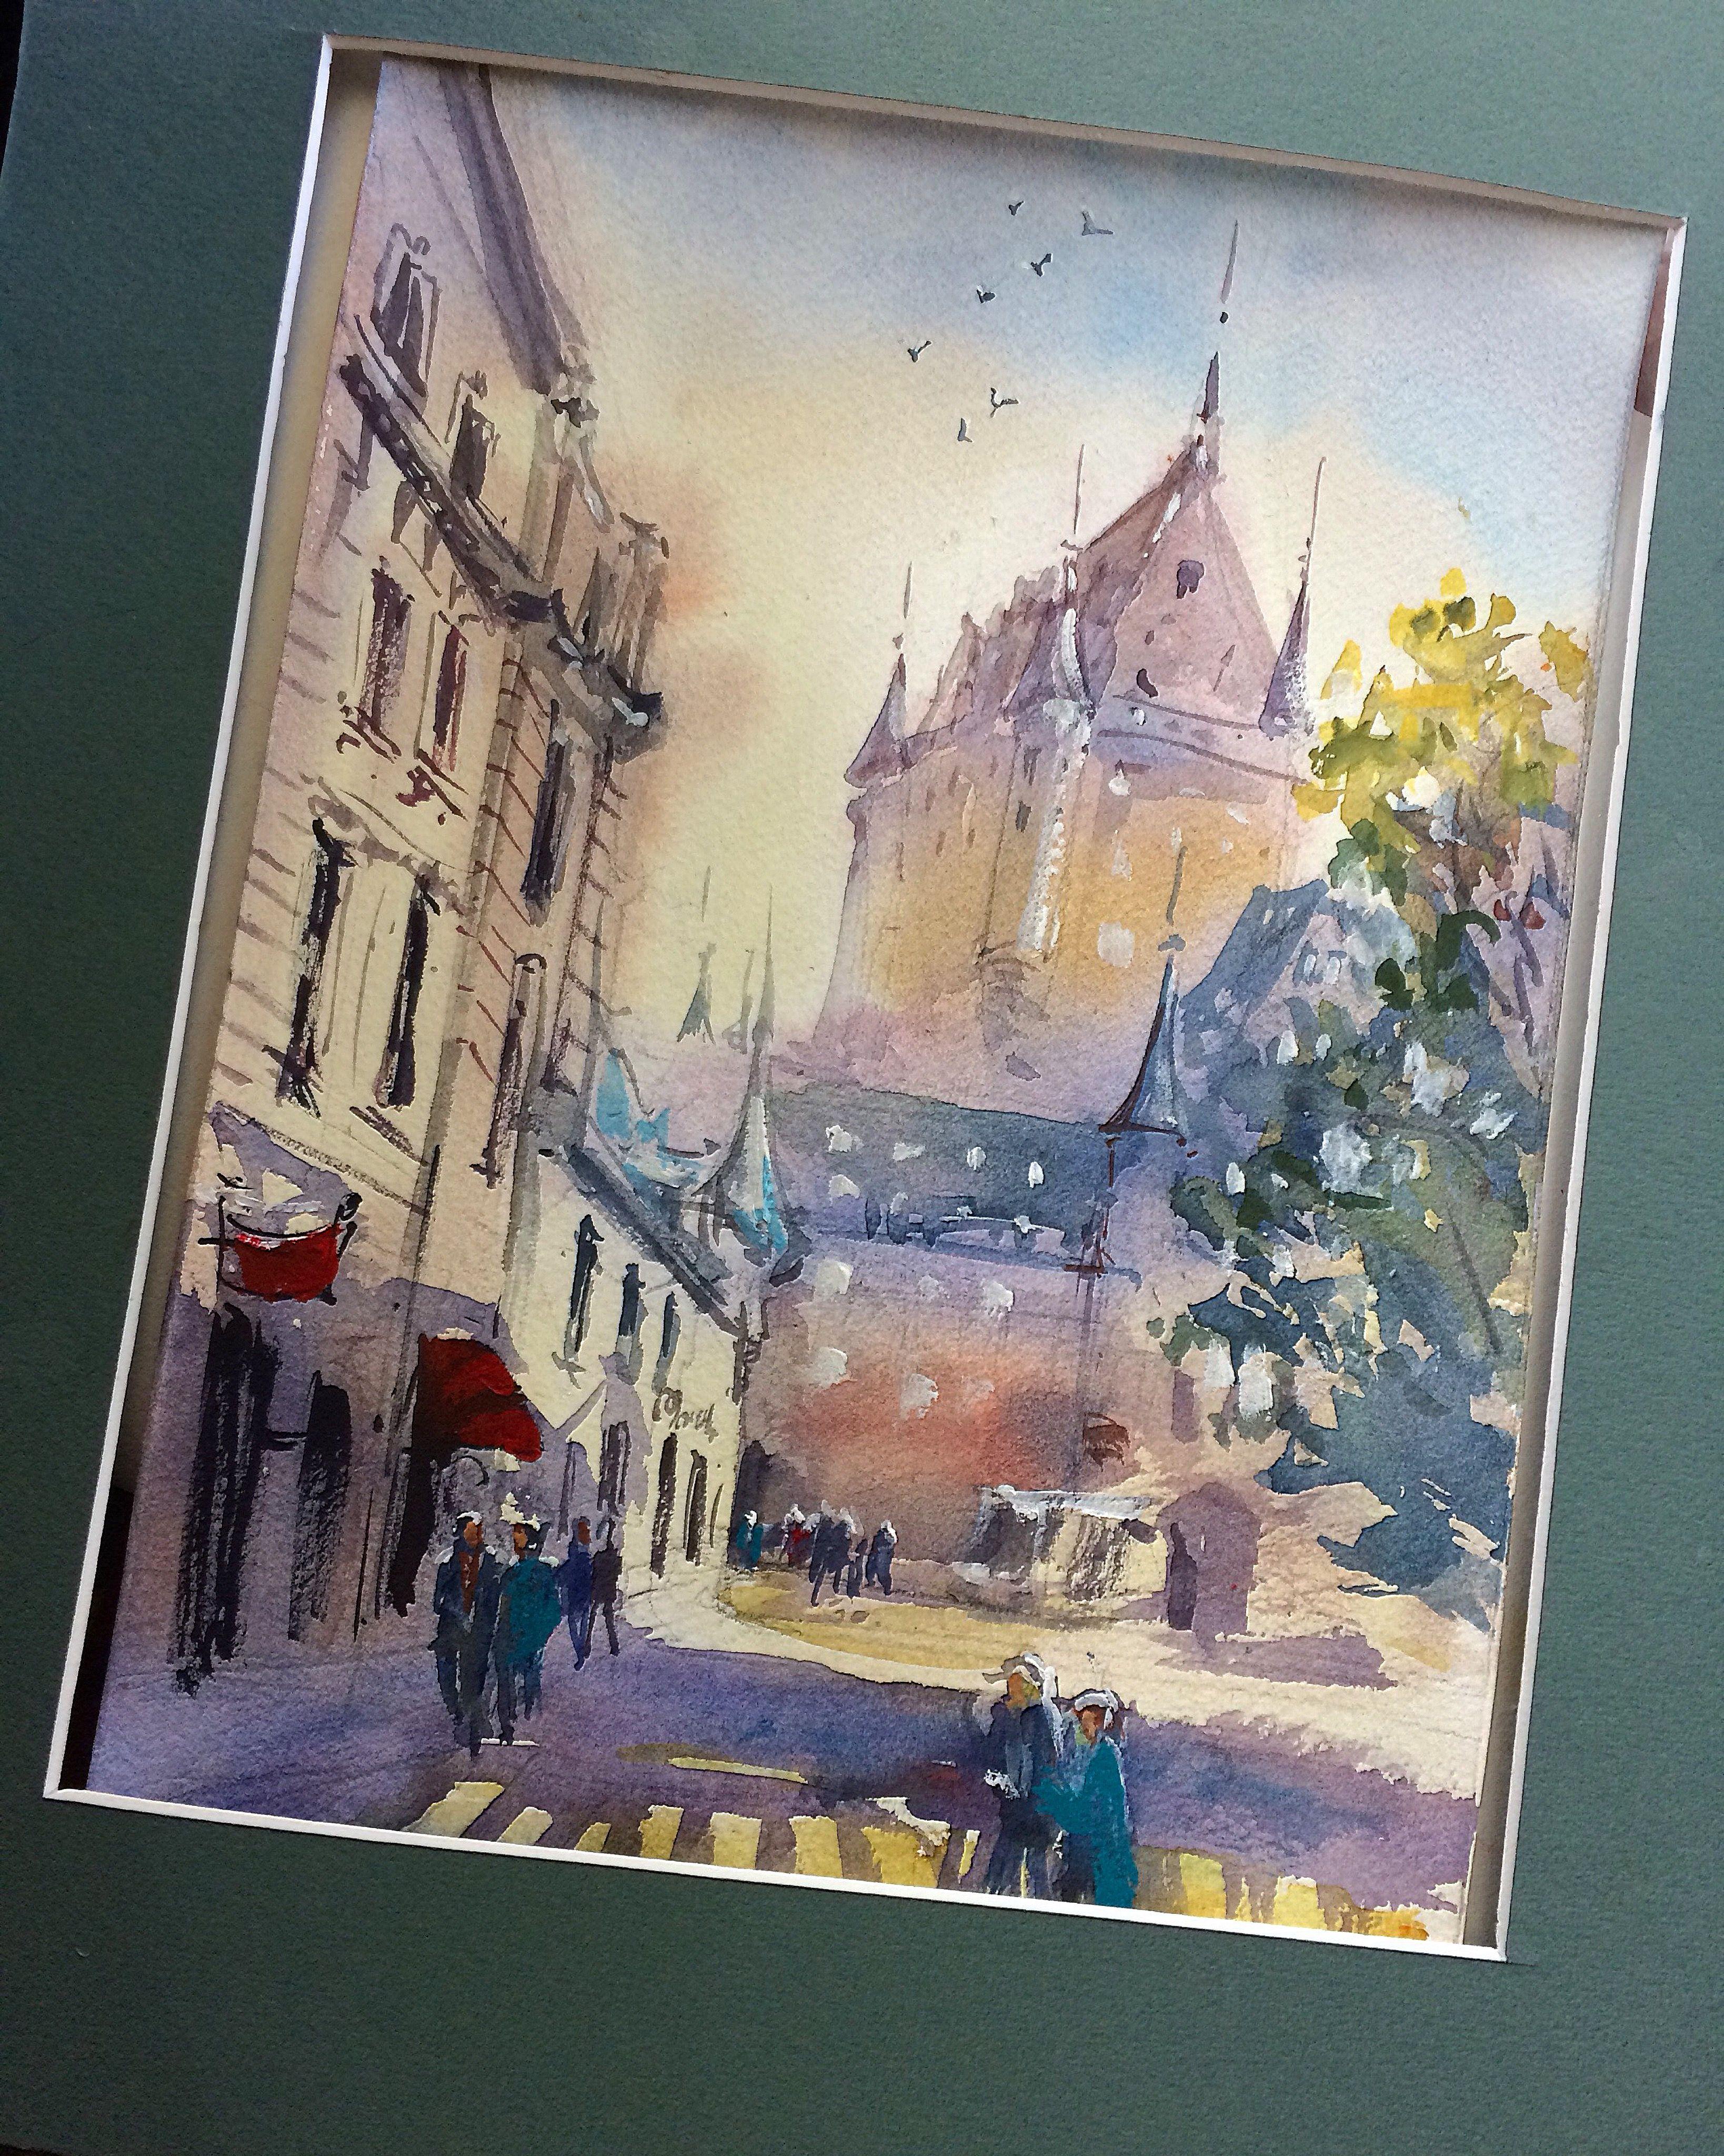 Hanna Zahorna Watercolour Painting Of Quebec City 2017